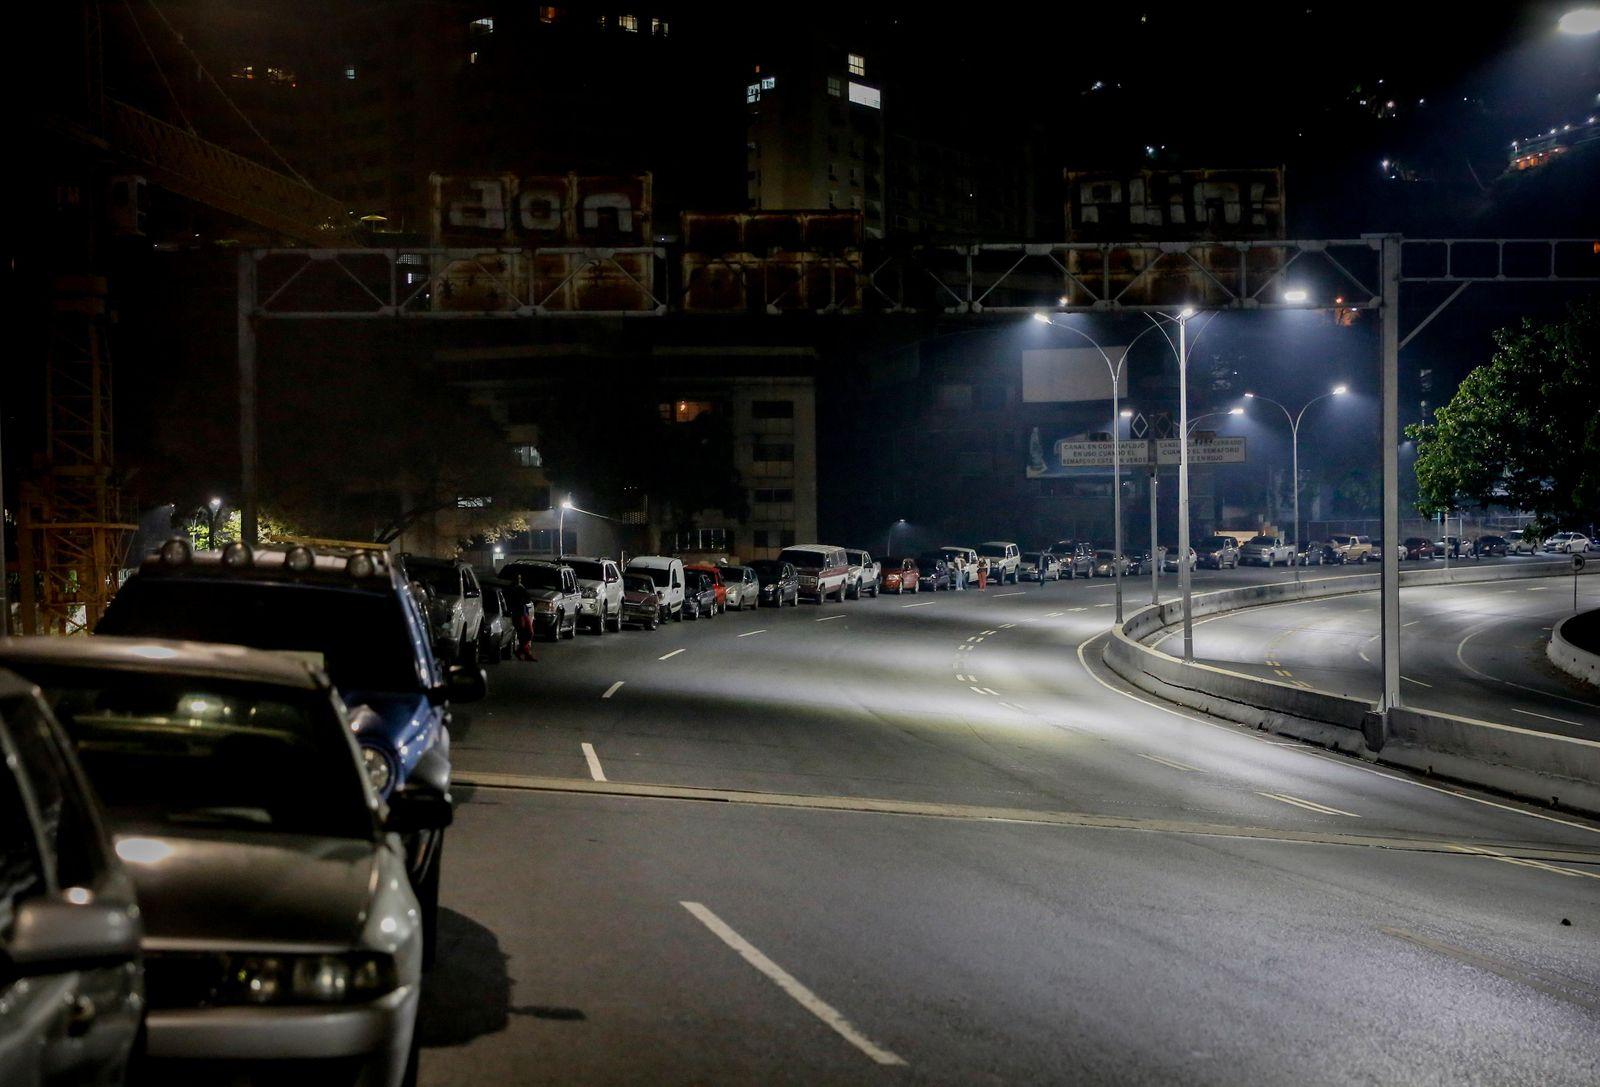 Spritmangel in Venezuela